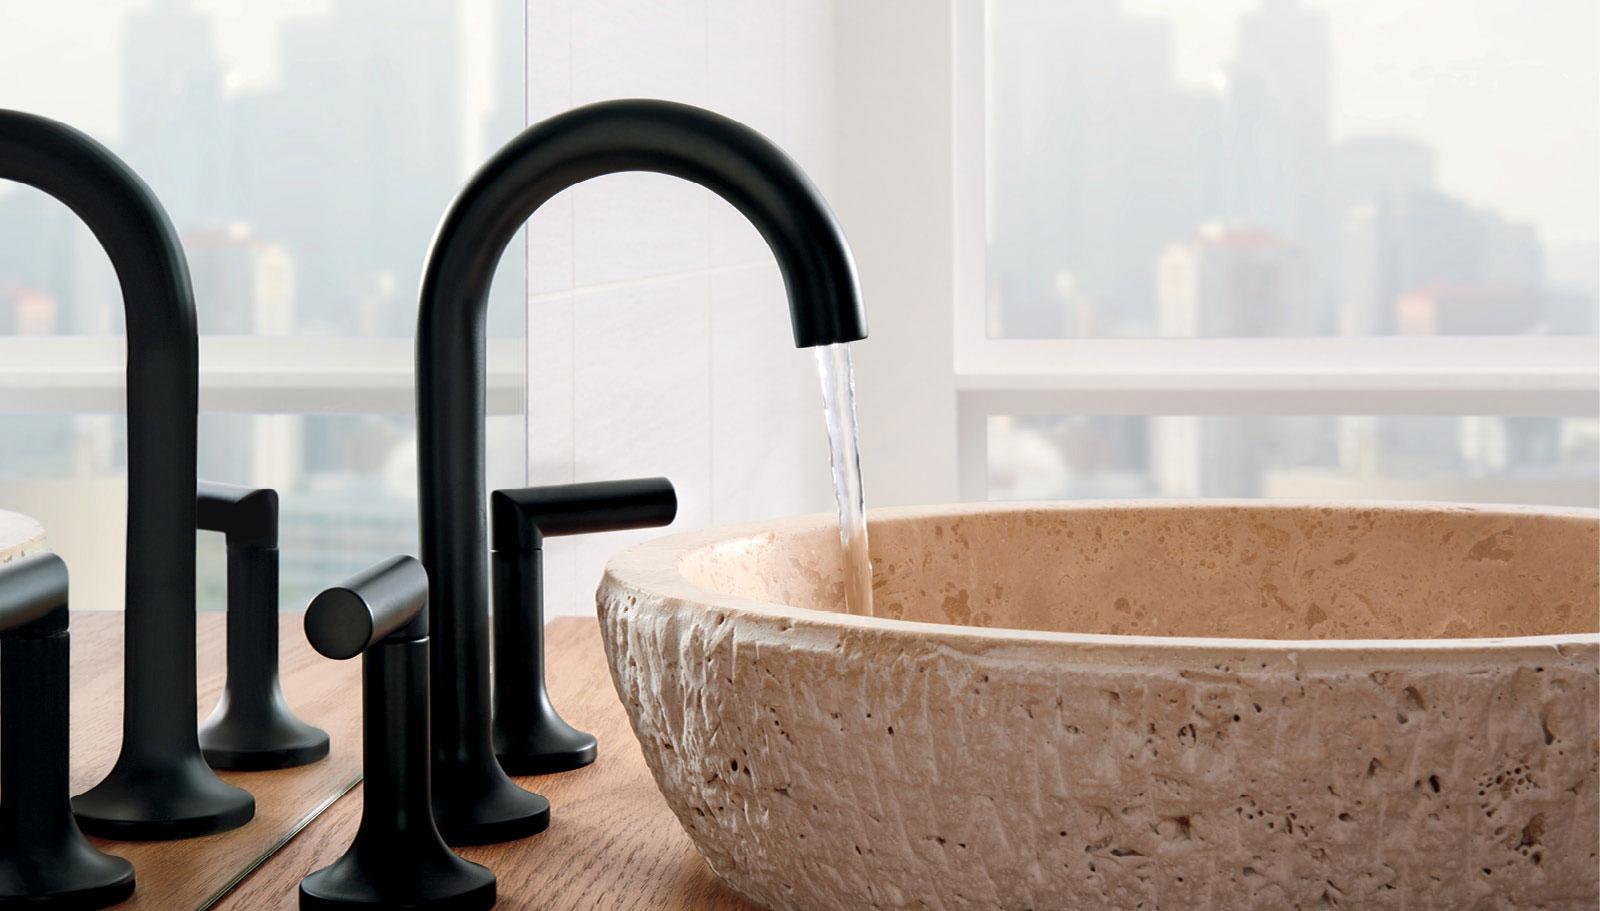 Black Bathroom Faucets  Black Faucets for Bathroom